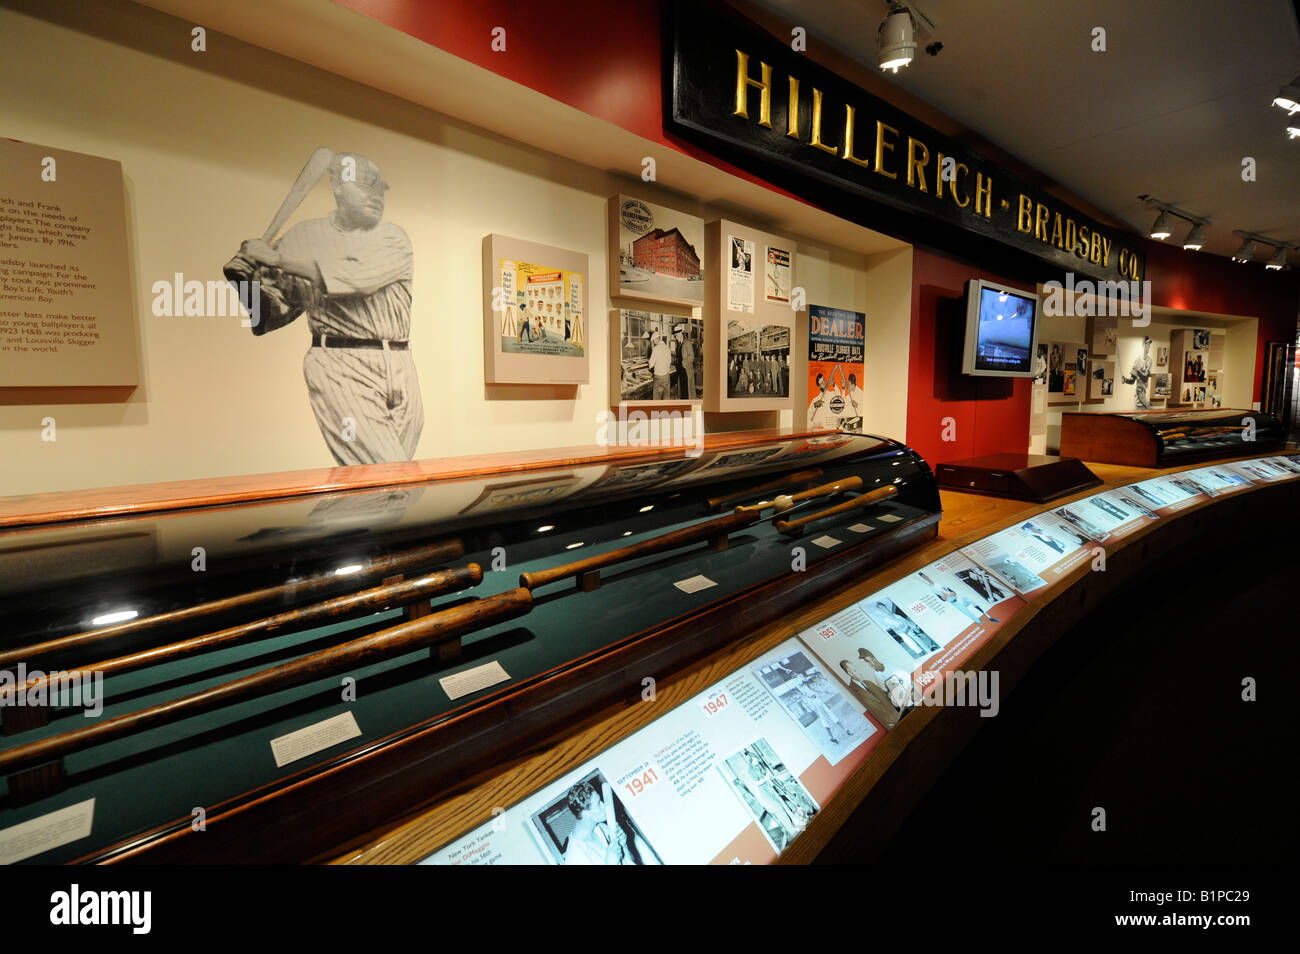 Louisville Slugger Baseball factory and Hillerich Bradsby museum at Louisville Kentucky KY - Stock Image